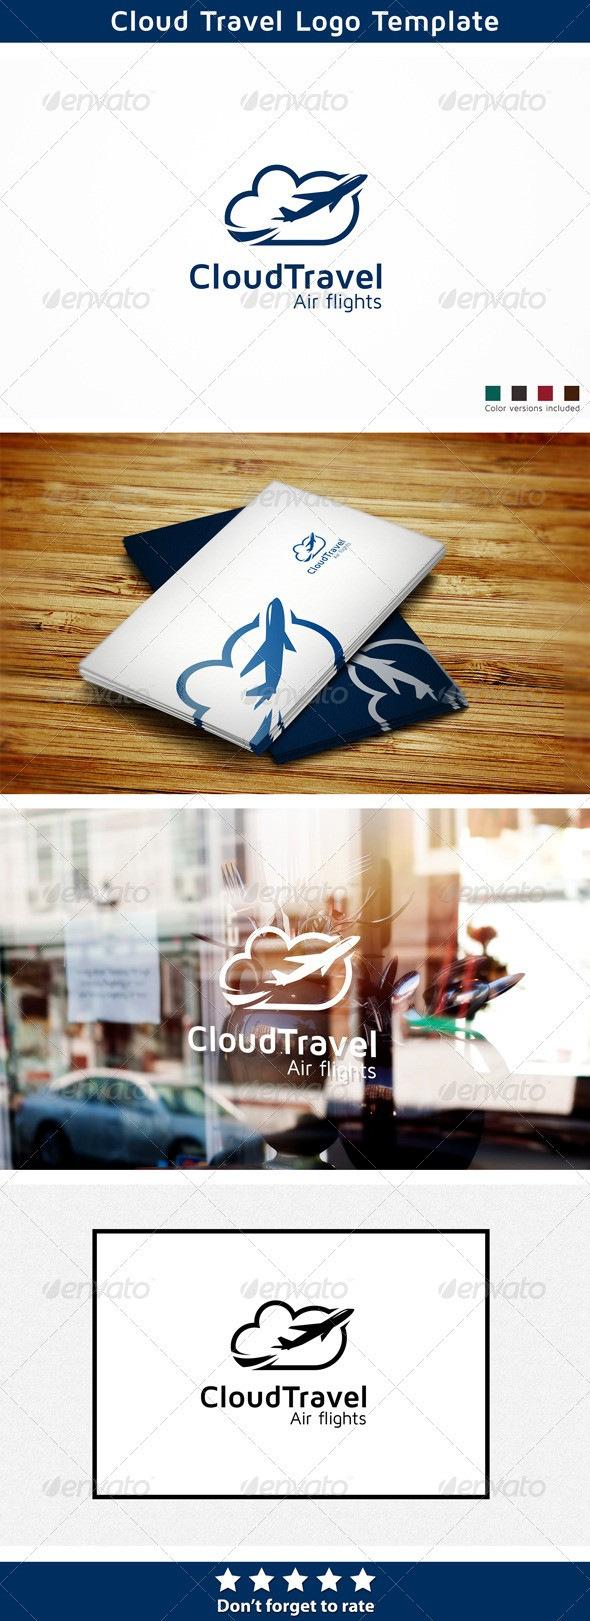 Cloud Travel logo design download